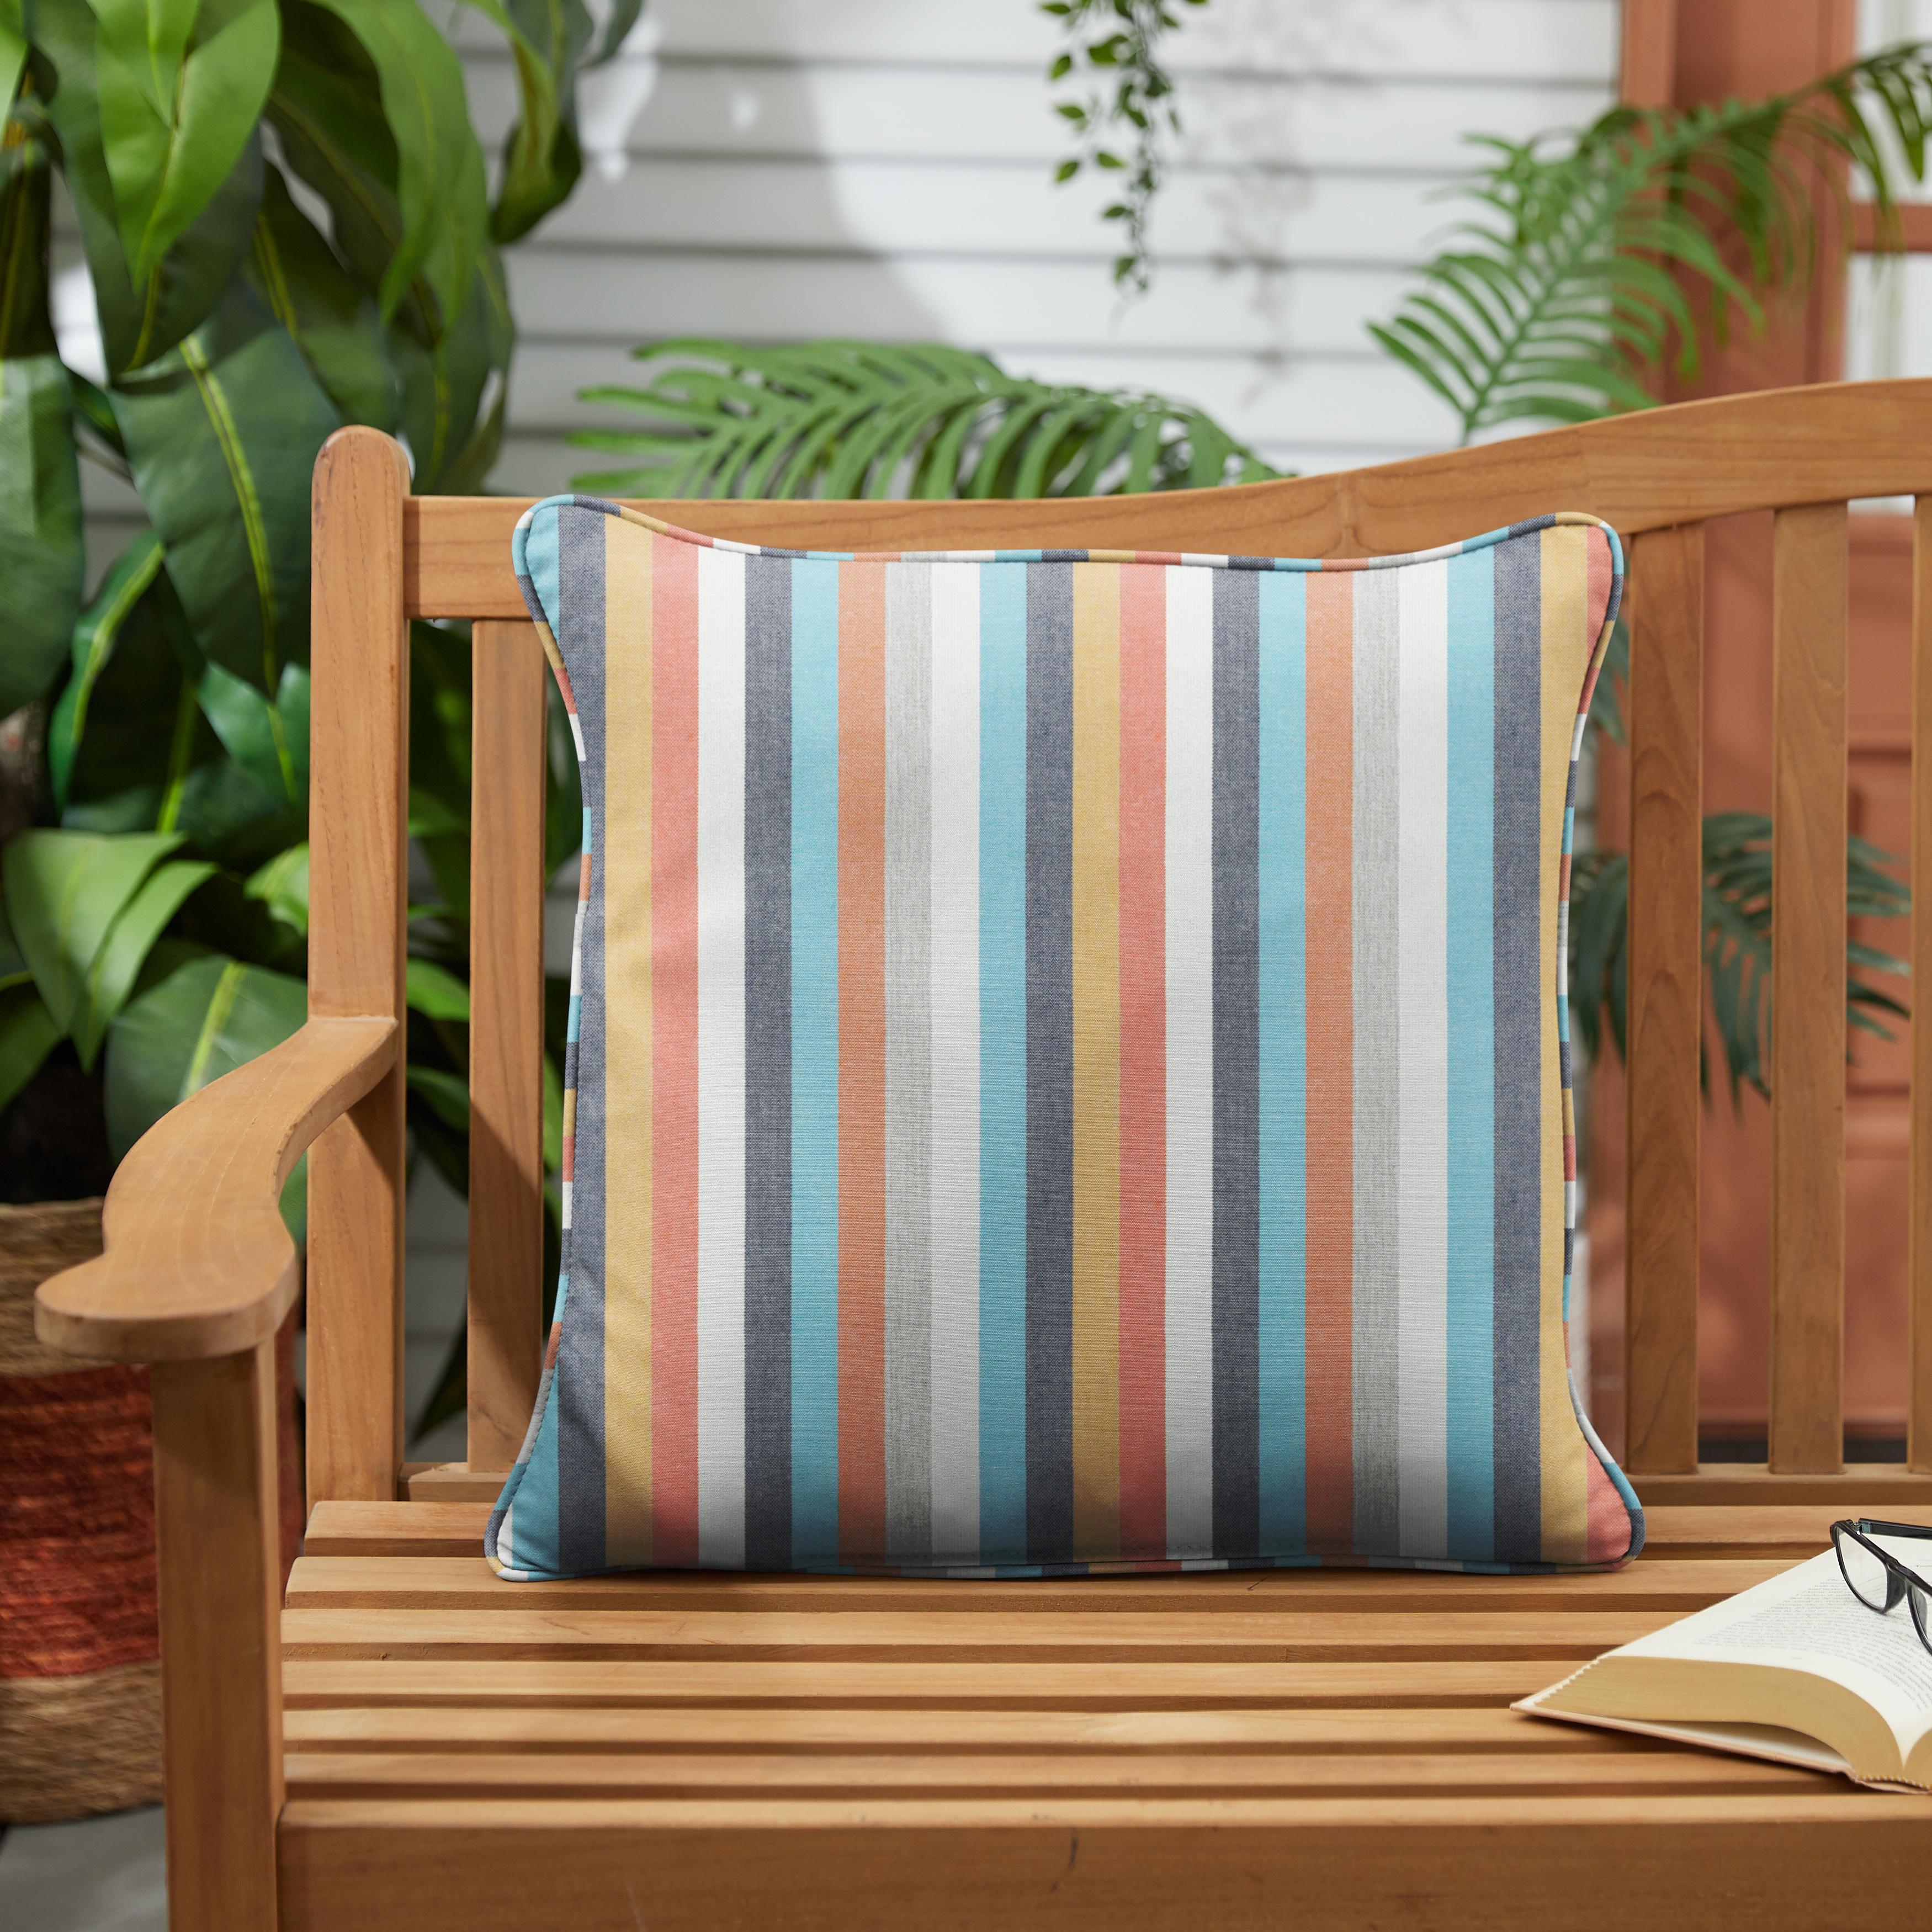 Sunbrella Surround Sunrise Set of 2 Outdoor Pillows